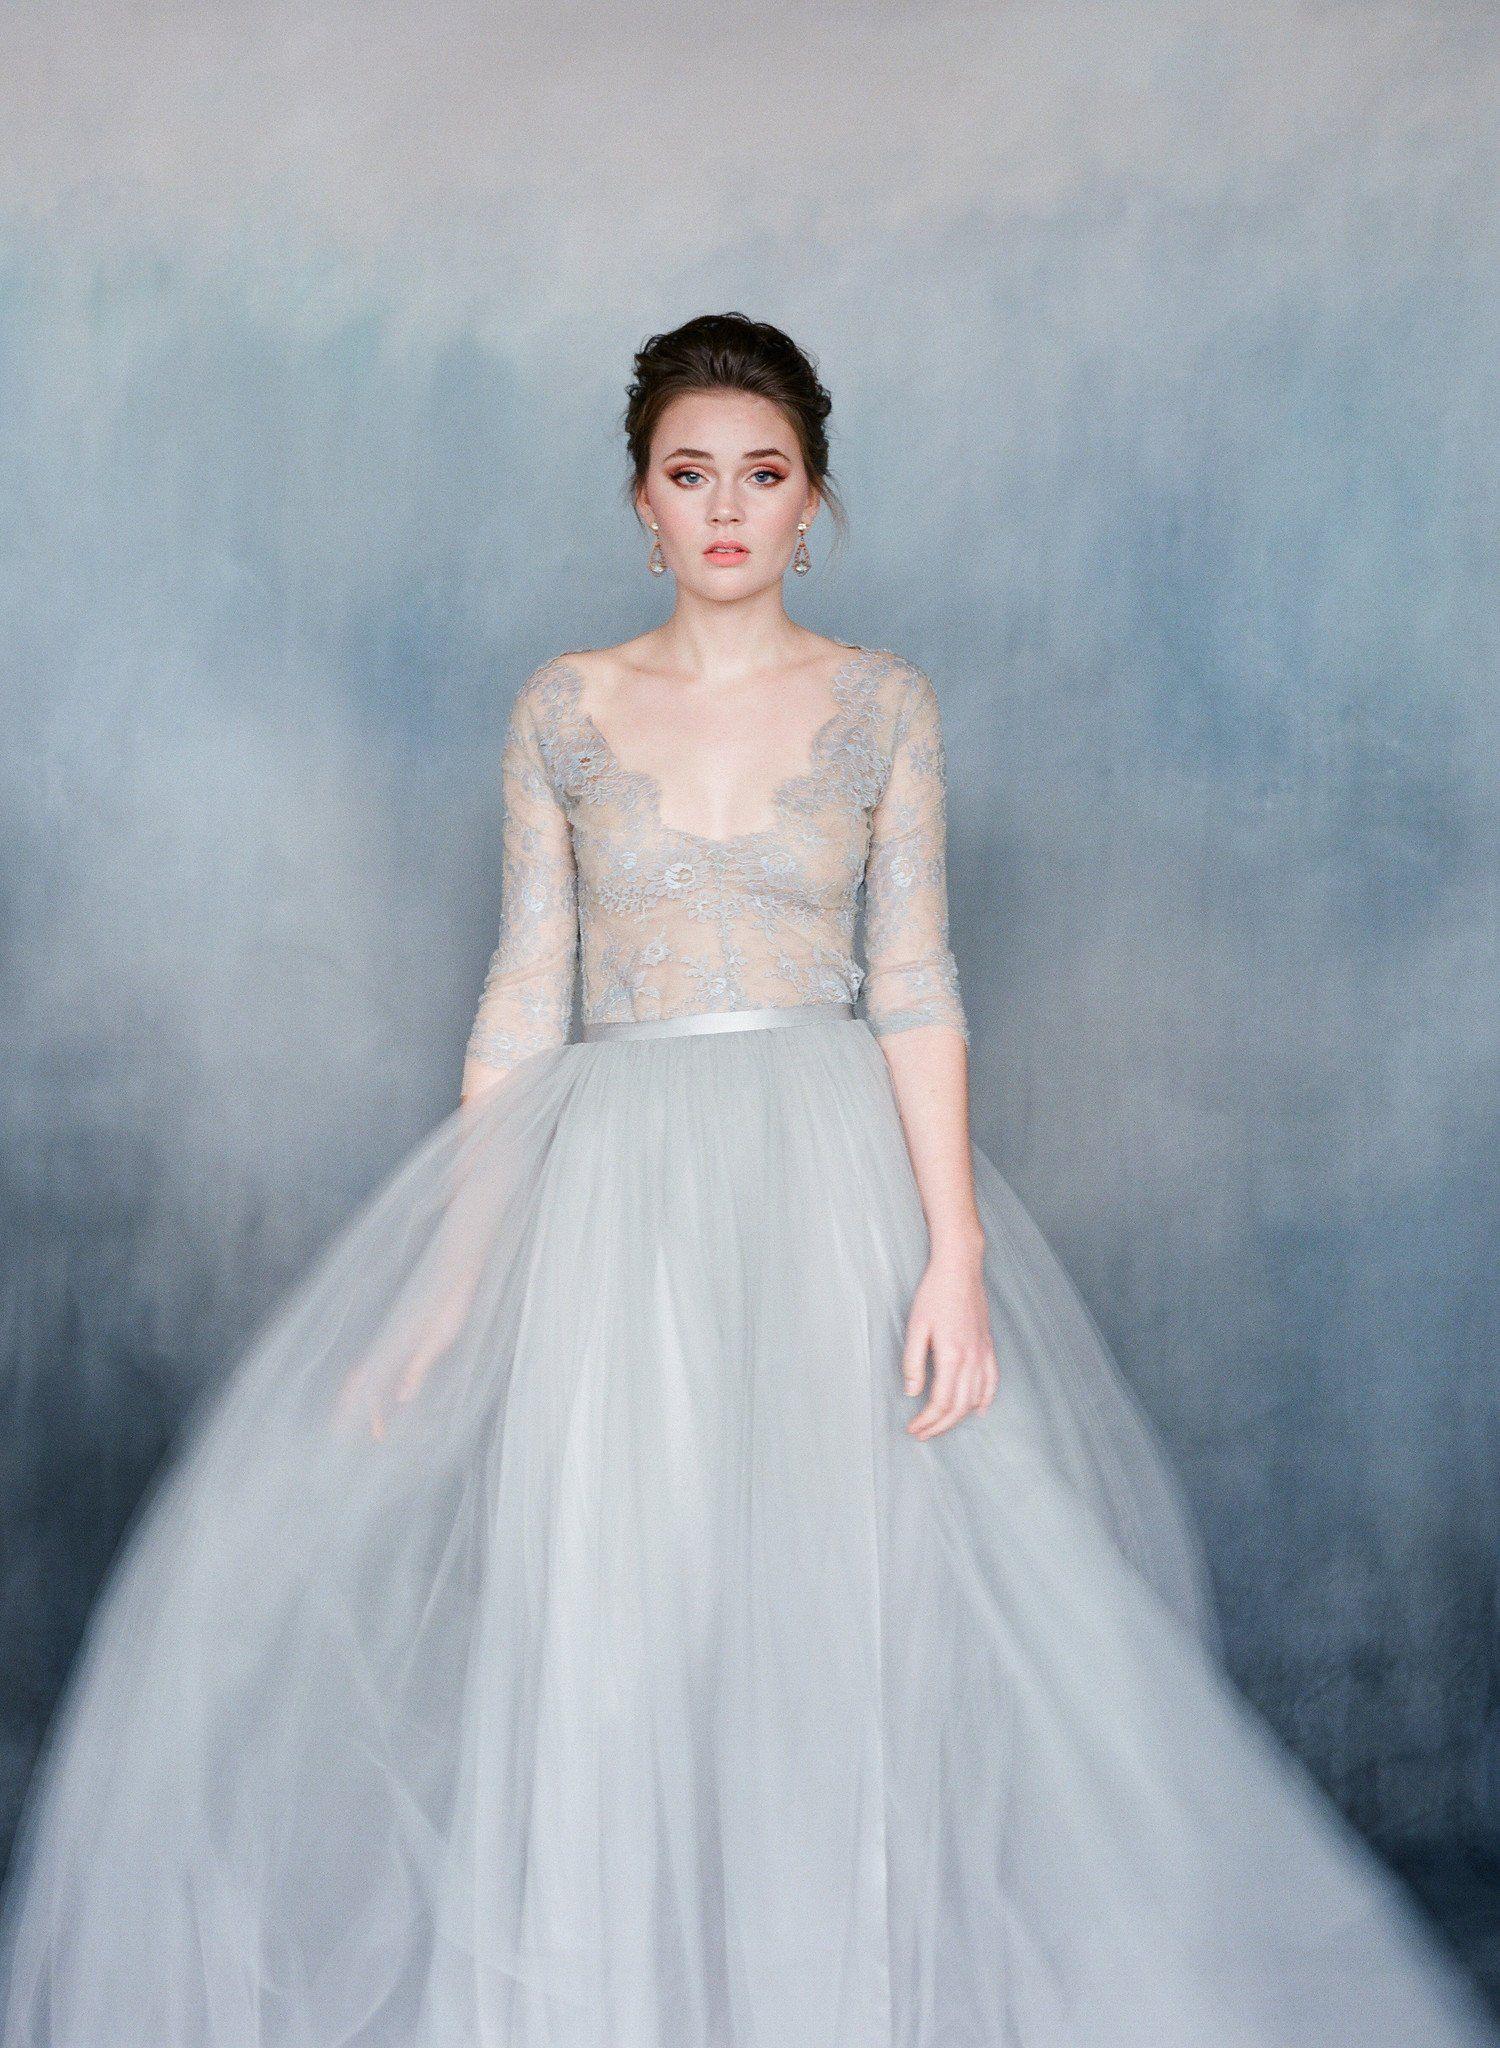 Nightingale | Nightingale, Wedding dress and Wedding